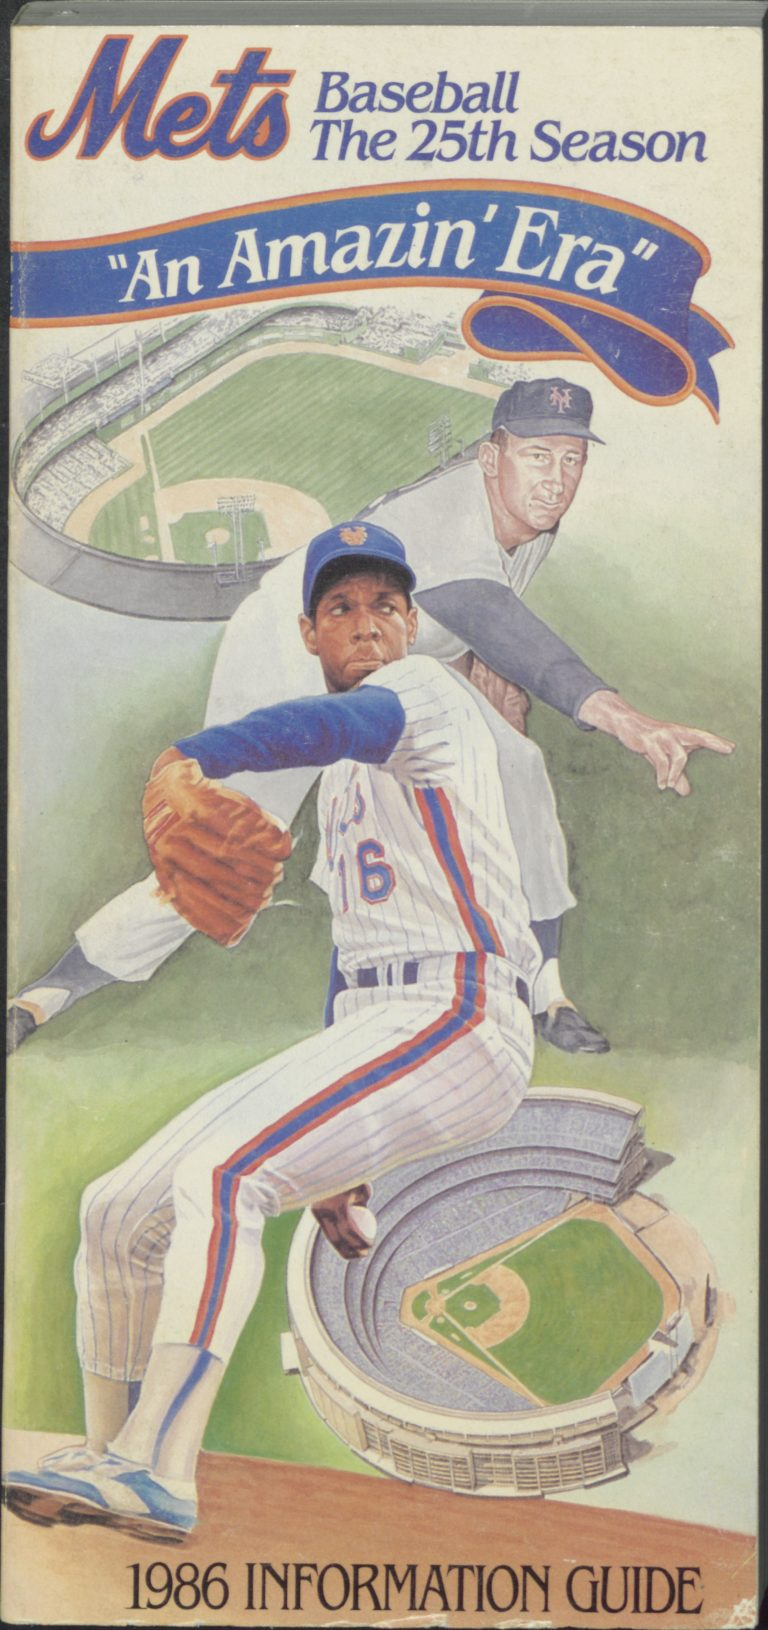 1986 Mets Information Guide: 25th Season